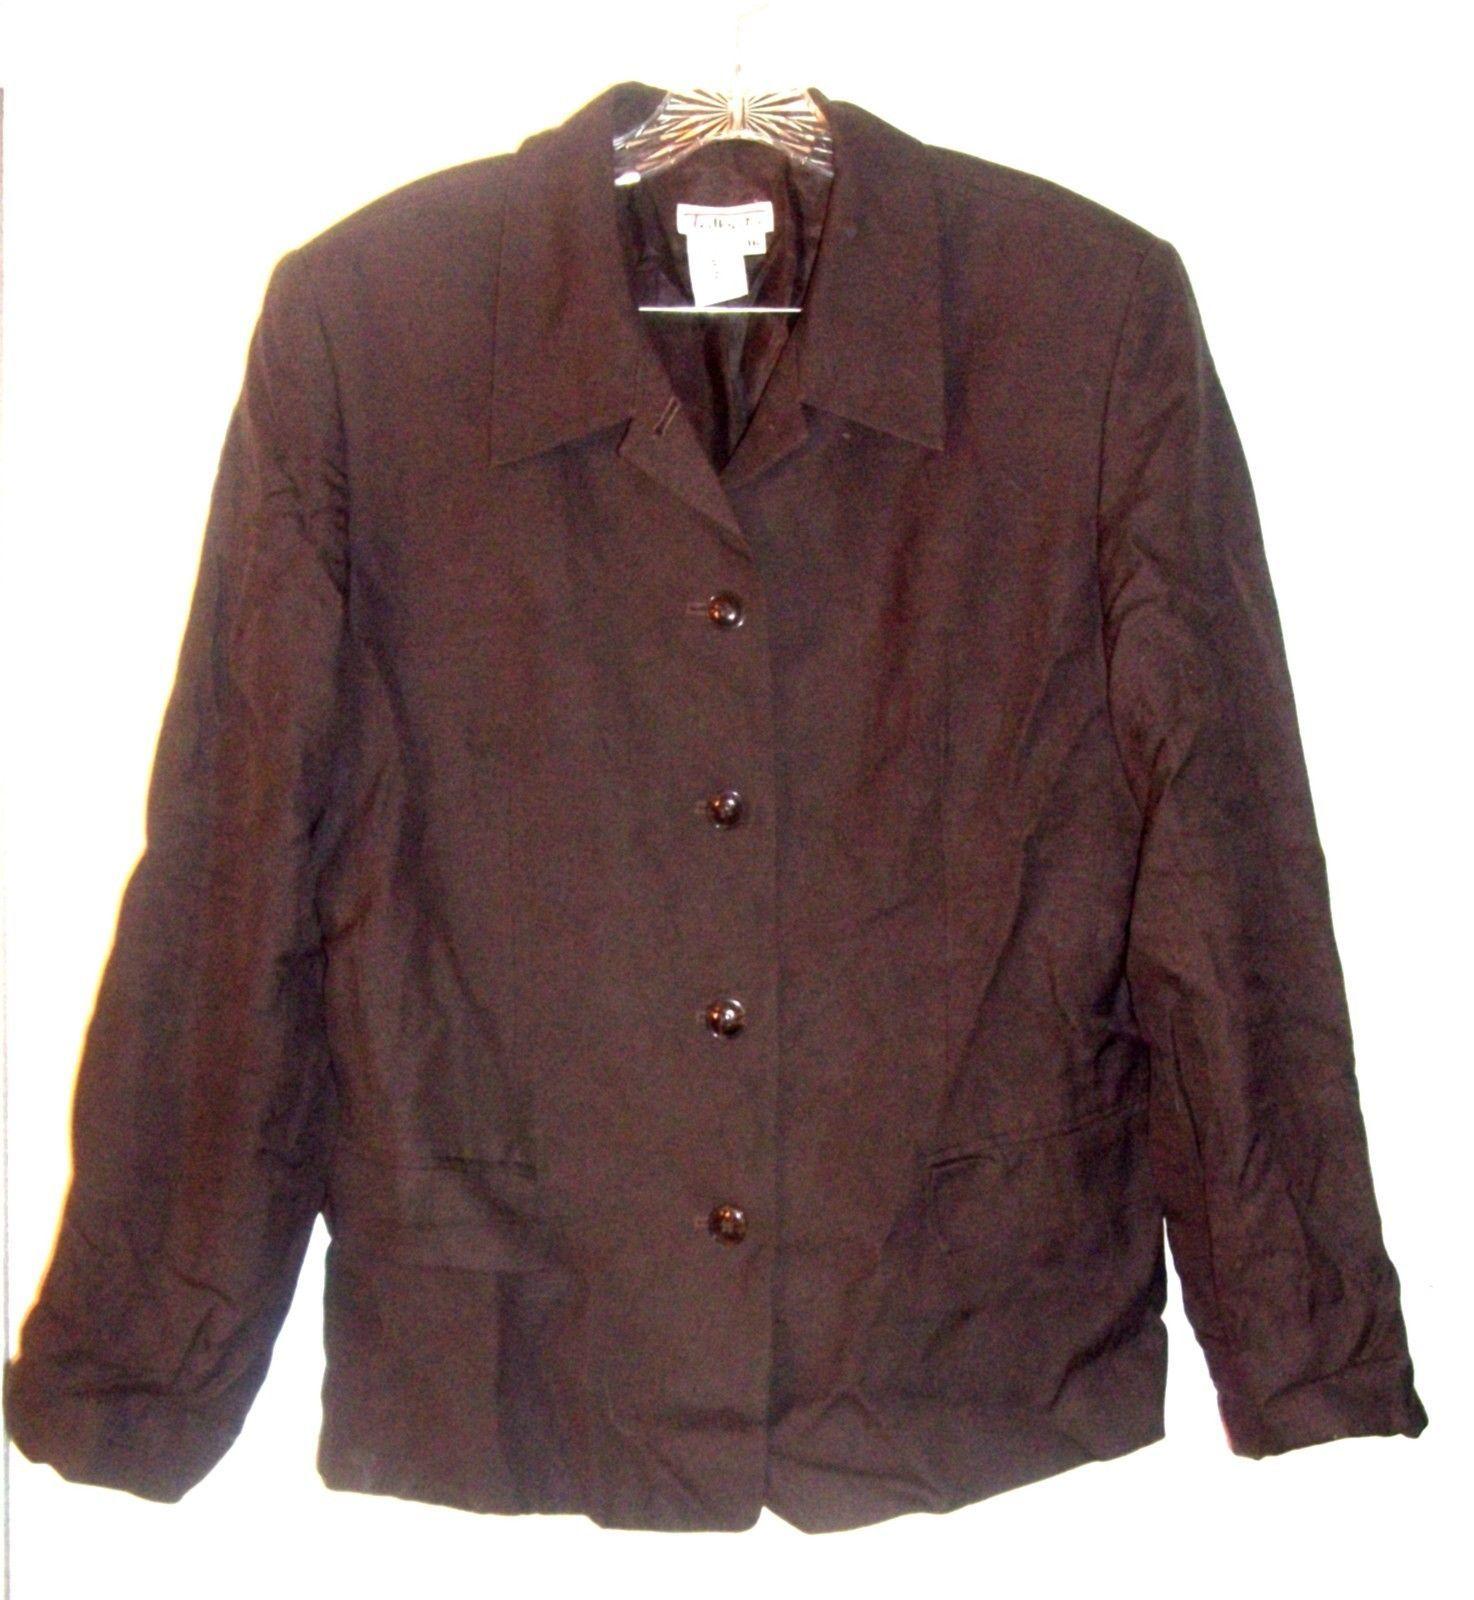 Sz 16 - Talbots Brown Rayon & Linen Blend Business Suit Jacket - $47.49